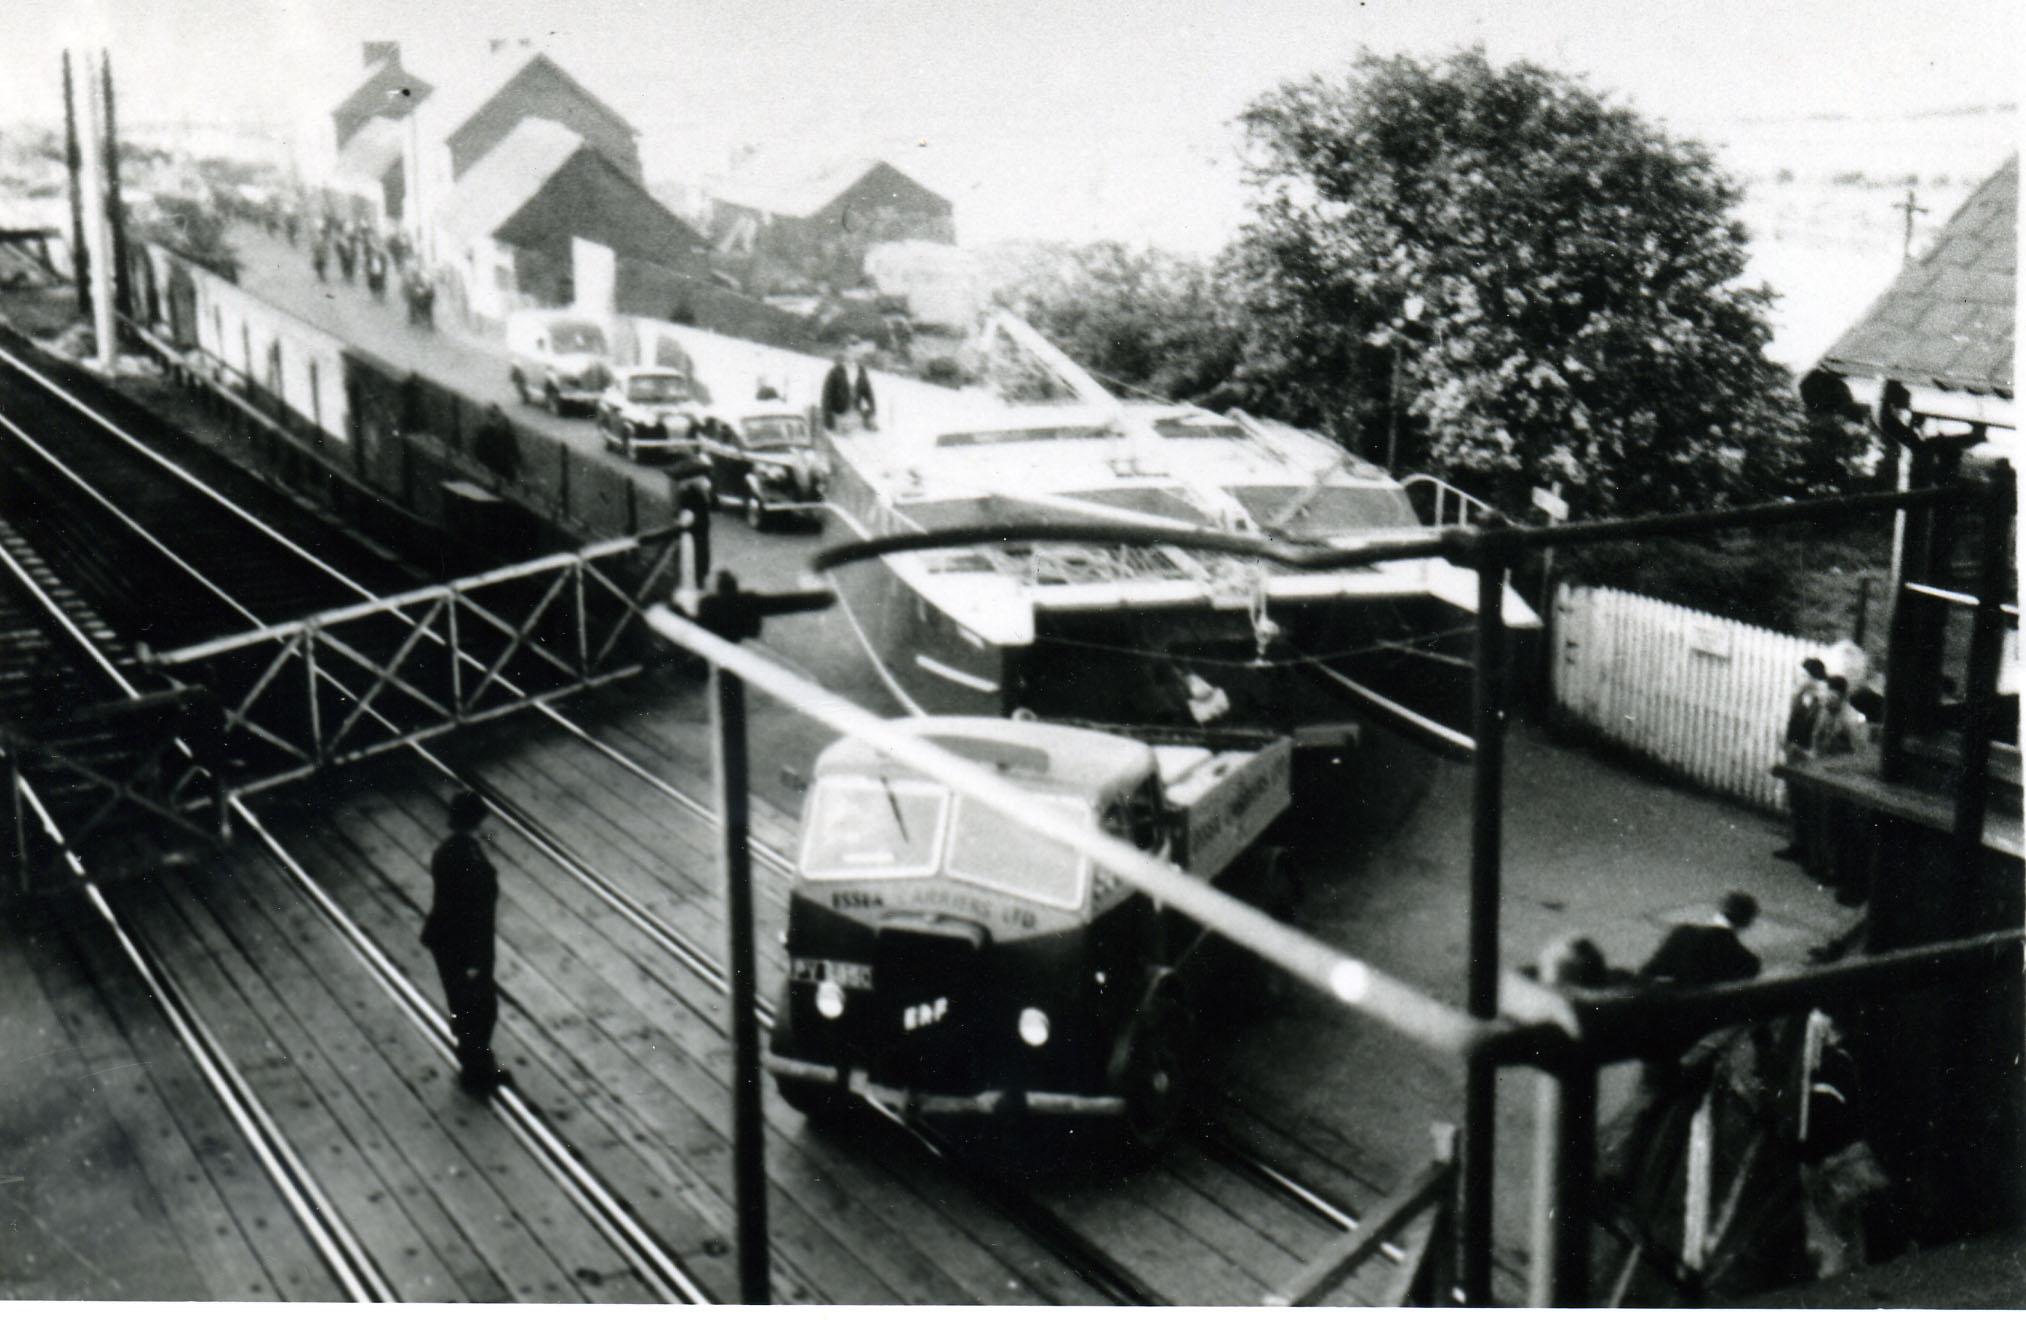 Canvey Island Old Bridge